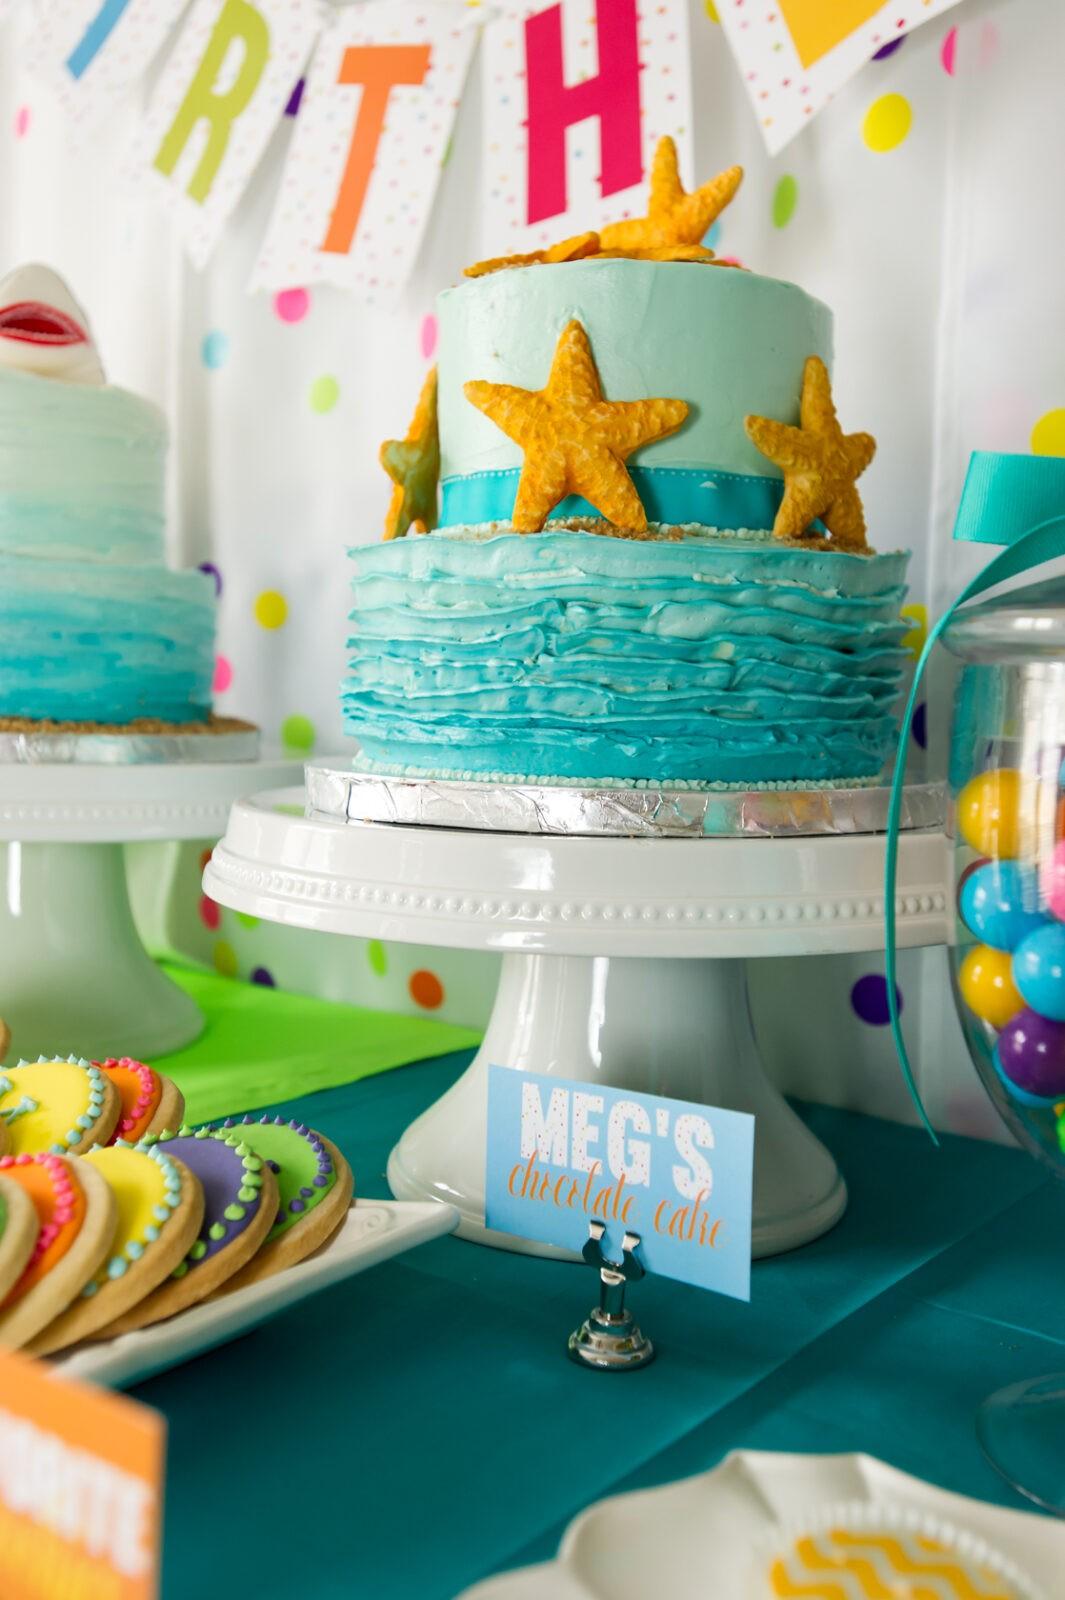 Top 10 Cake